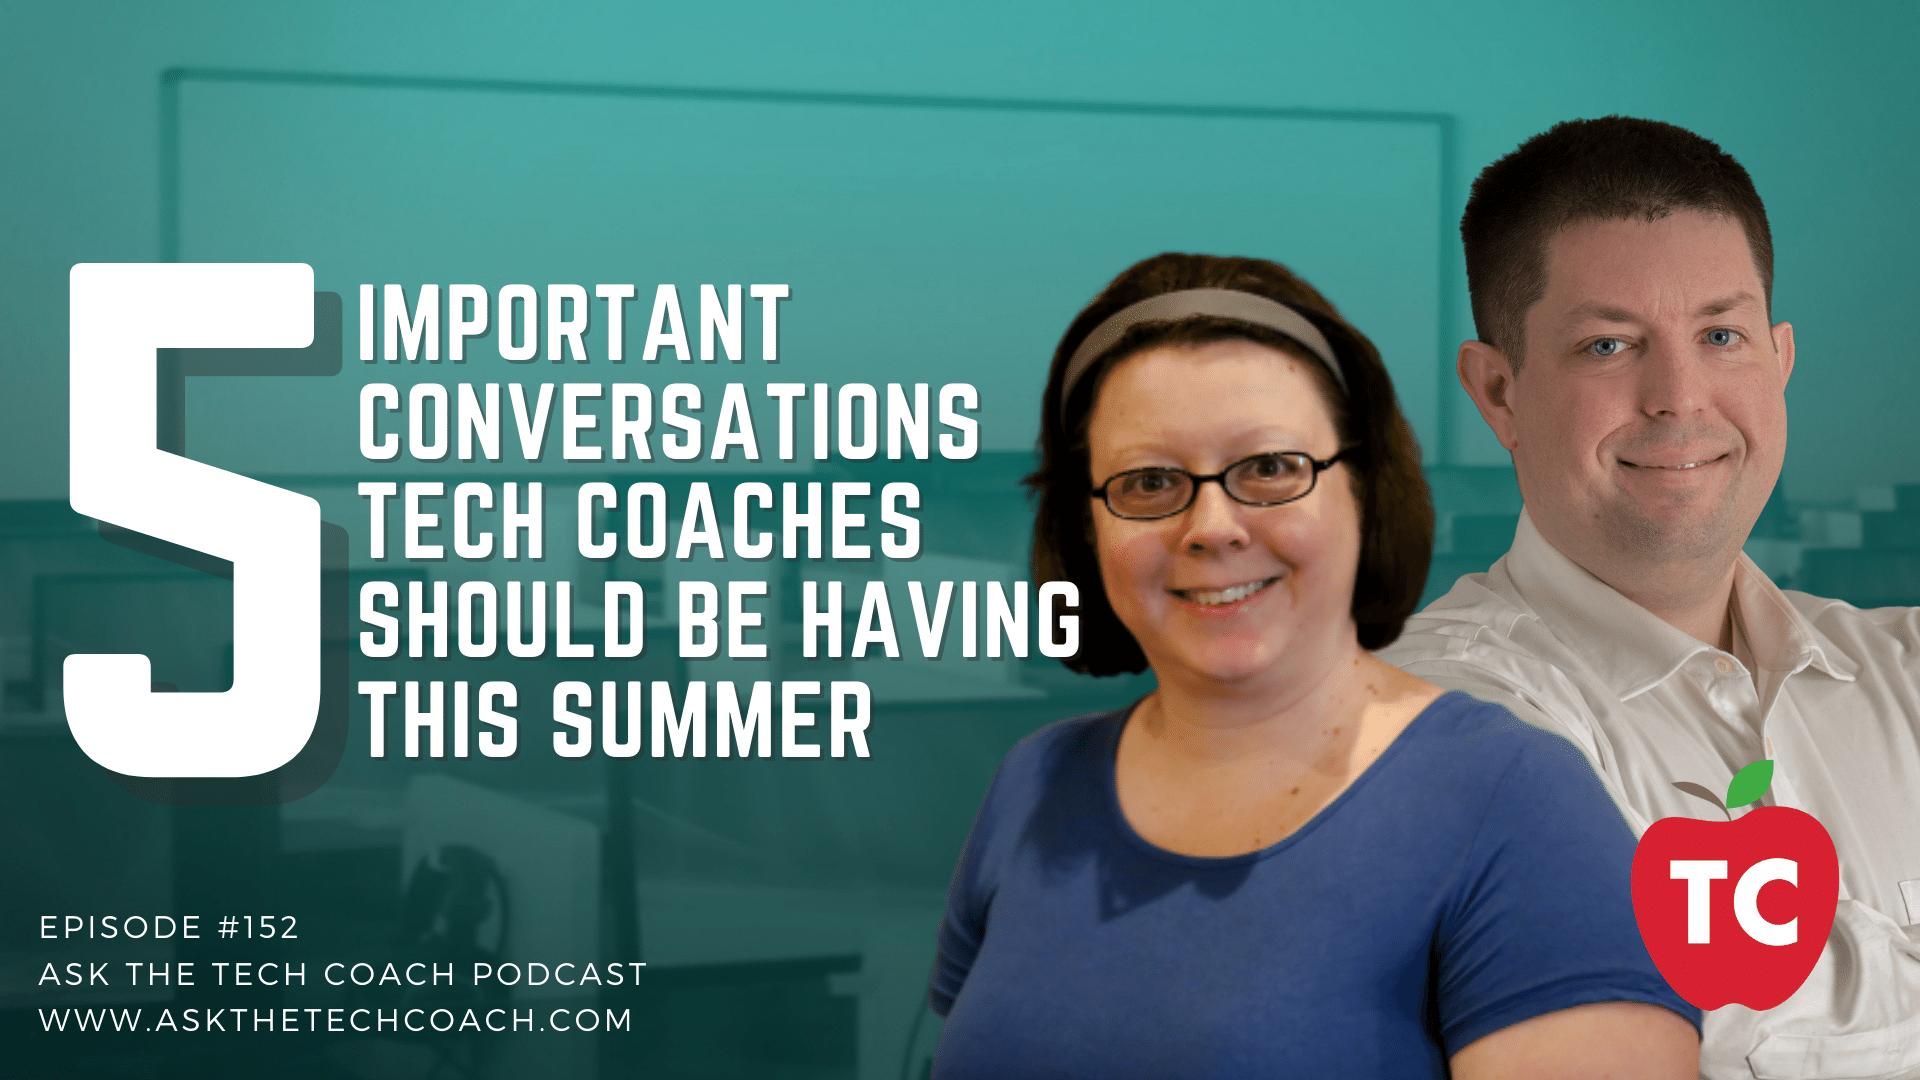 5 Important Summertime Conversations